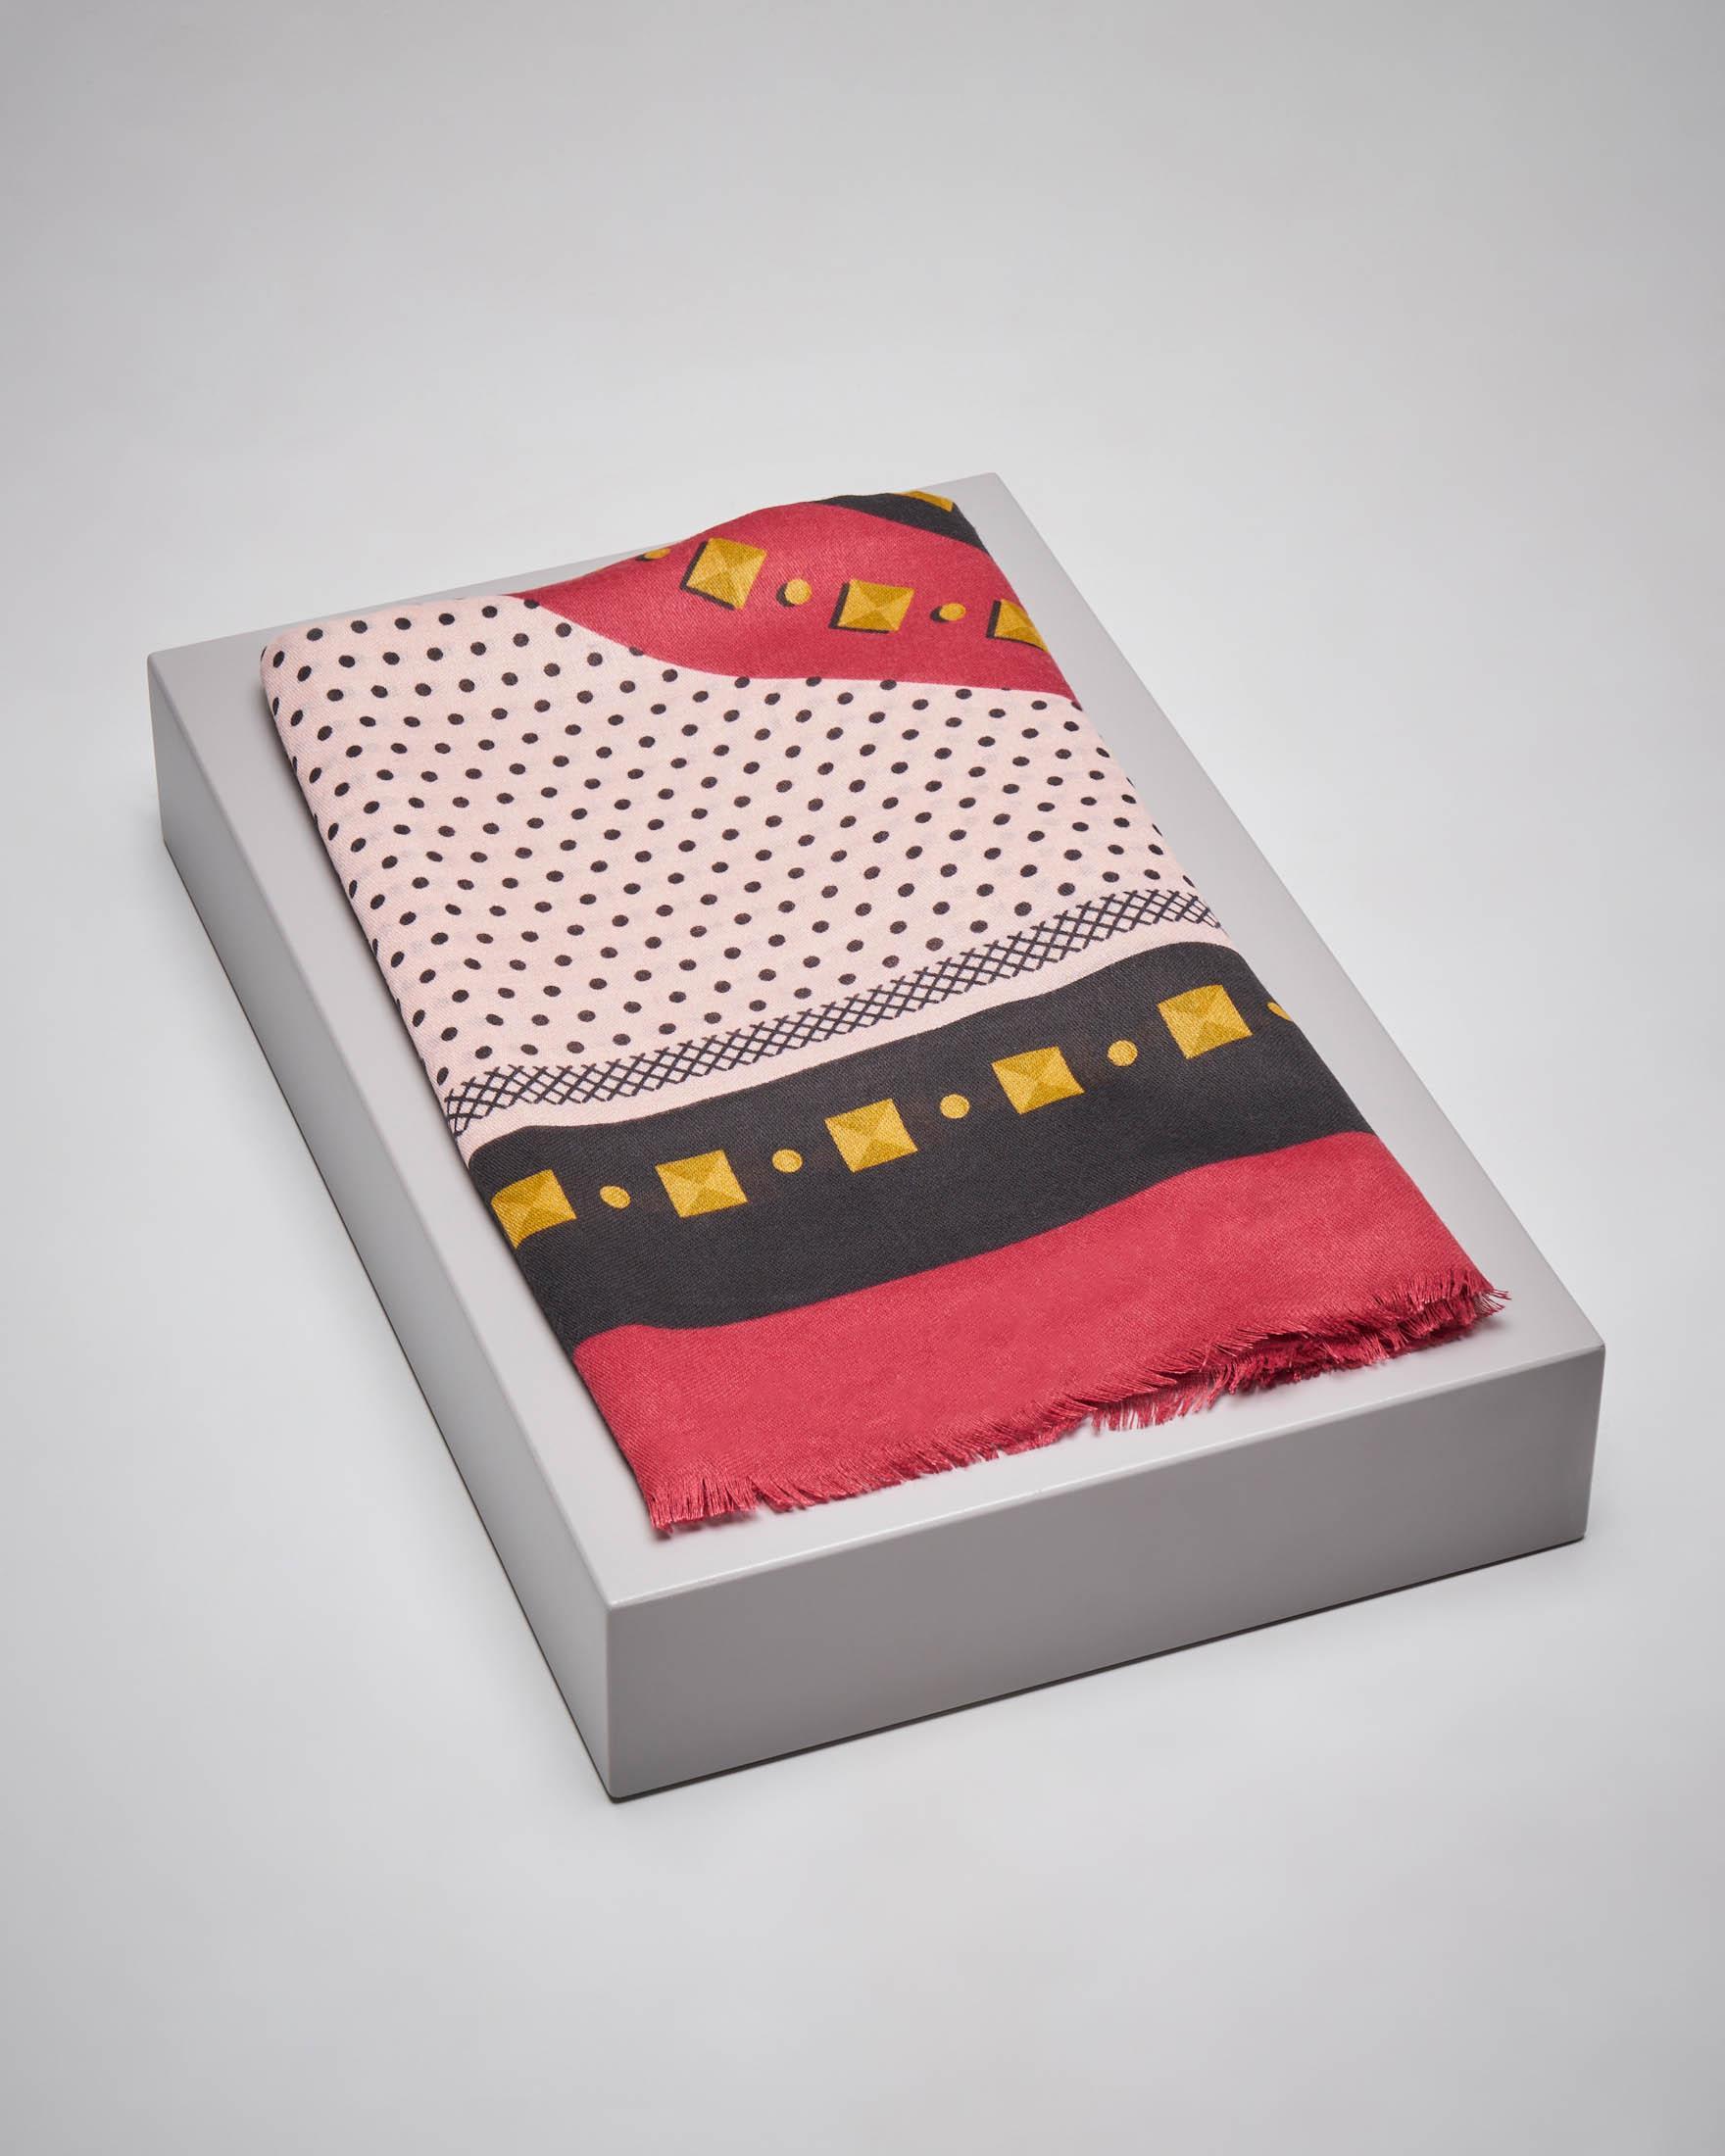 Maxi foulard rosso a fantasia a pois con logo